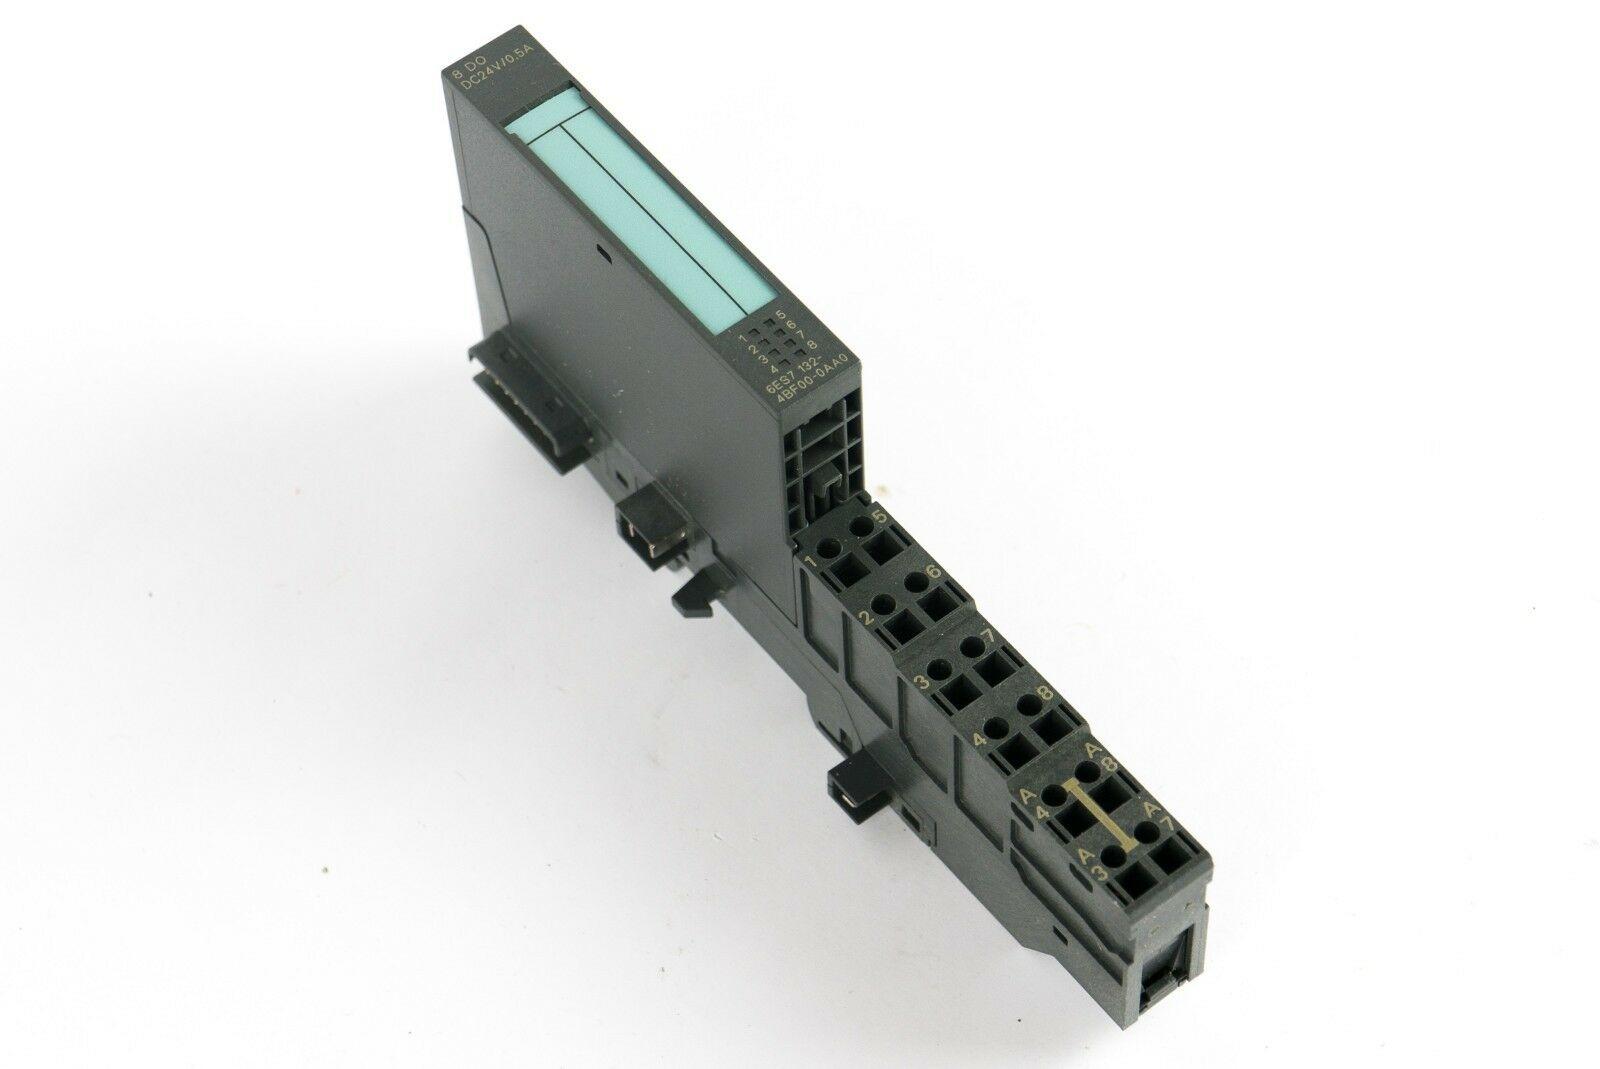 Siemens Simatic s7 6es7 132-4bf00-0aa0 //// 6es7132-4bf00-0aa0